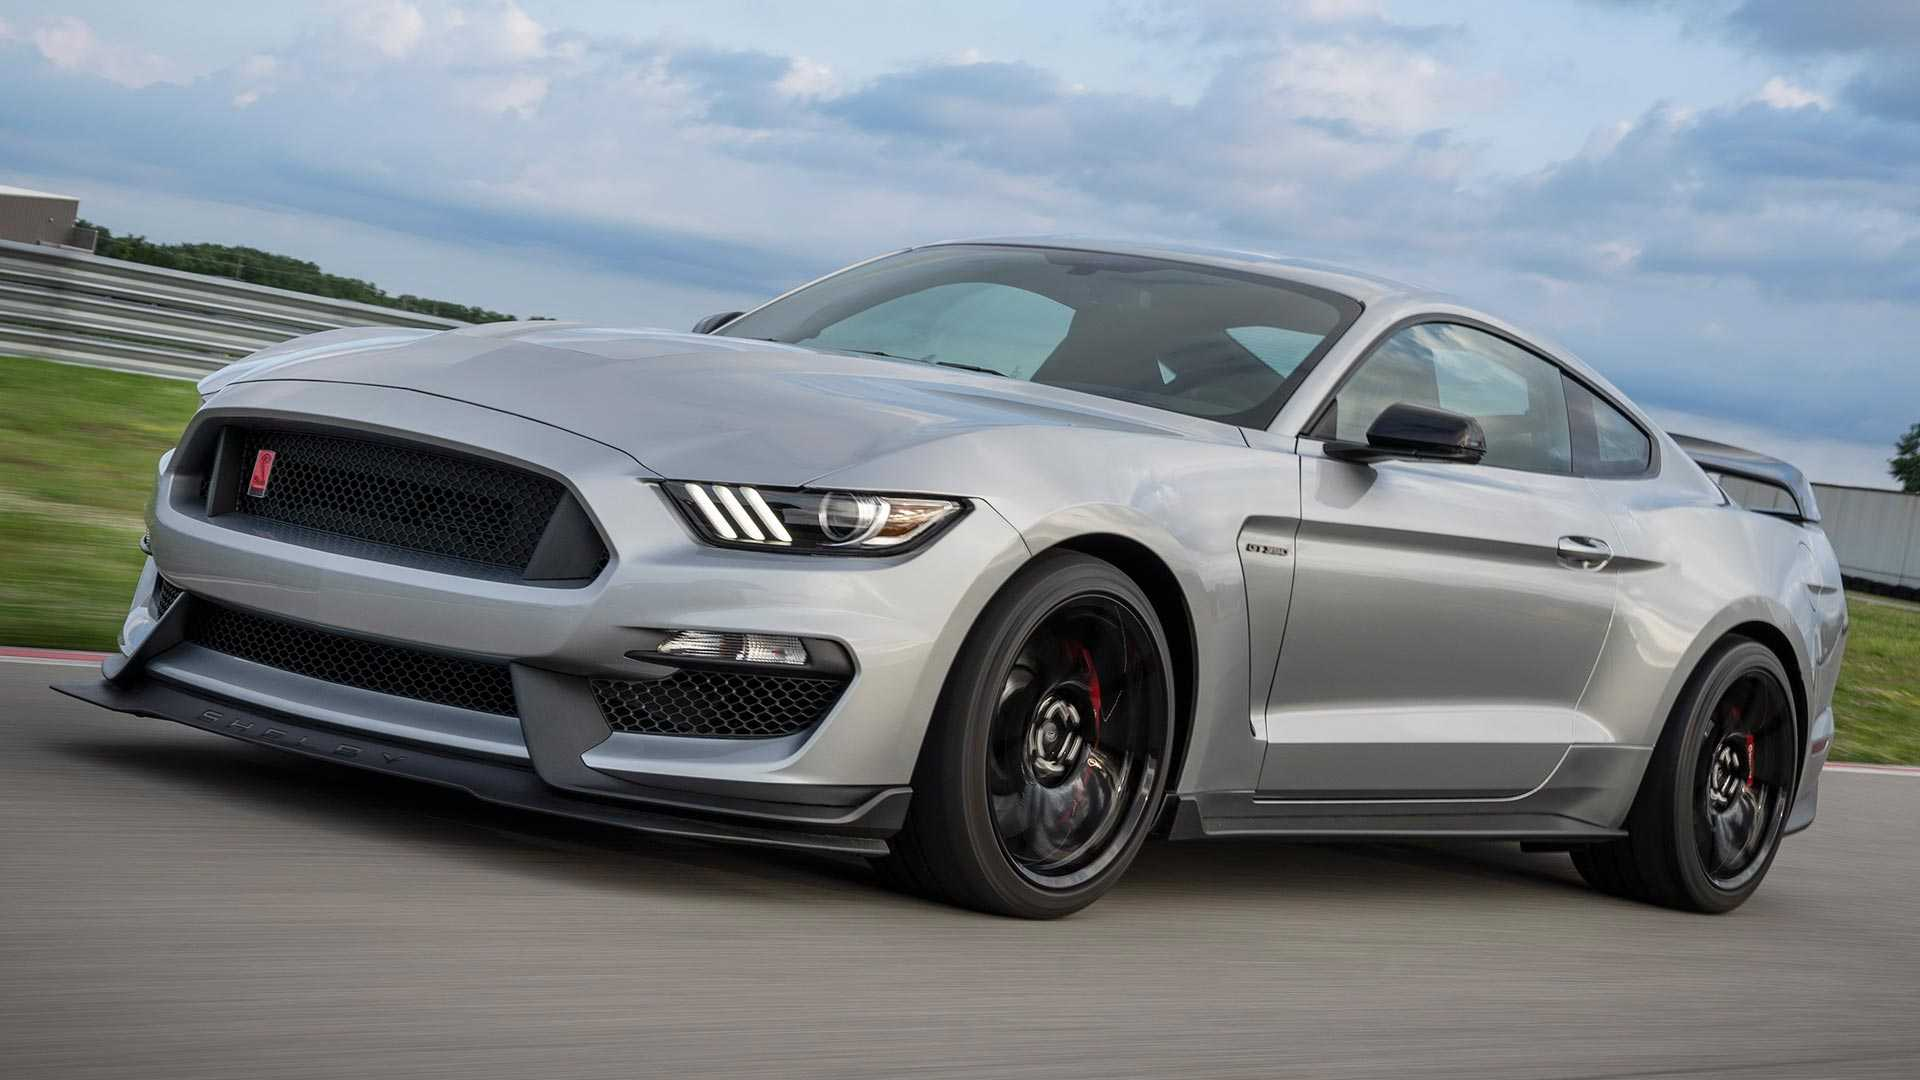 Ford Mustang Shelby Gt350r 2020 Suspensi Rem Harga Meningkat